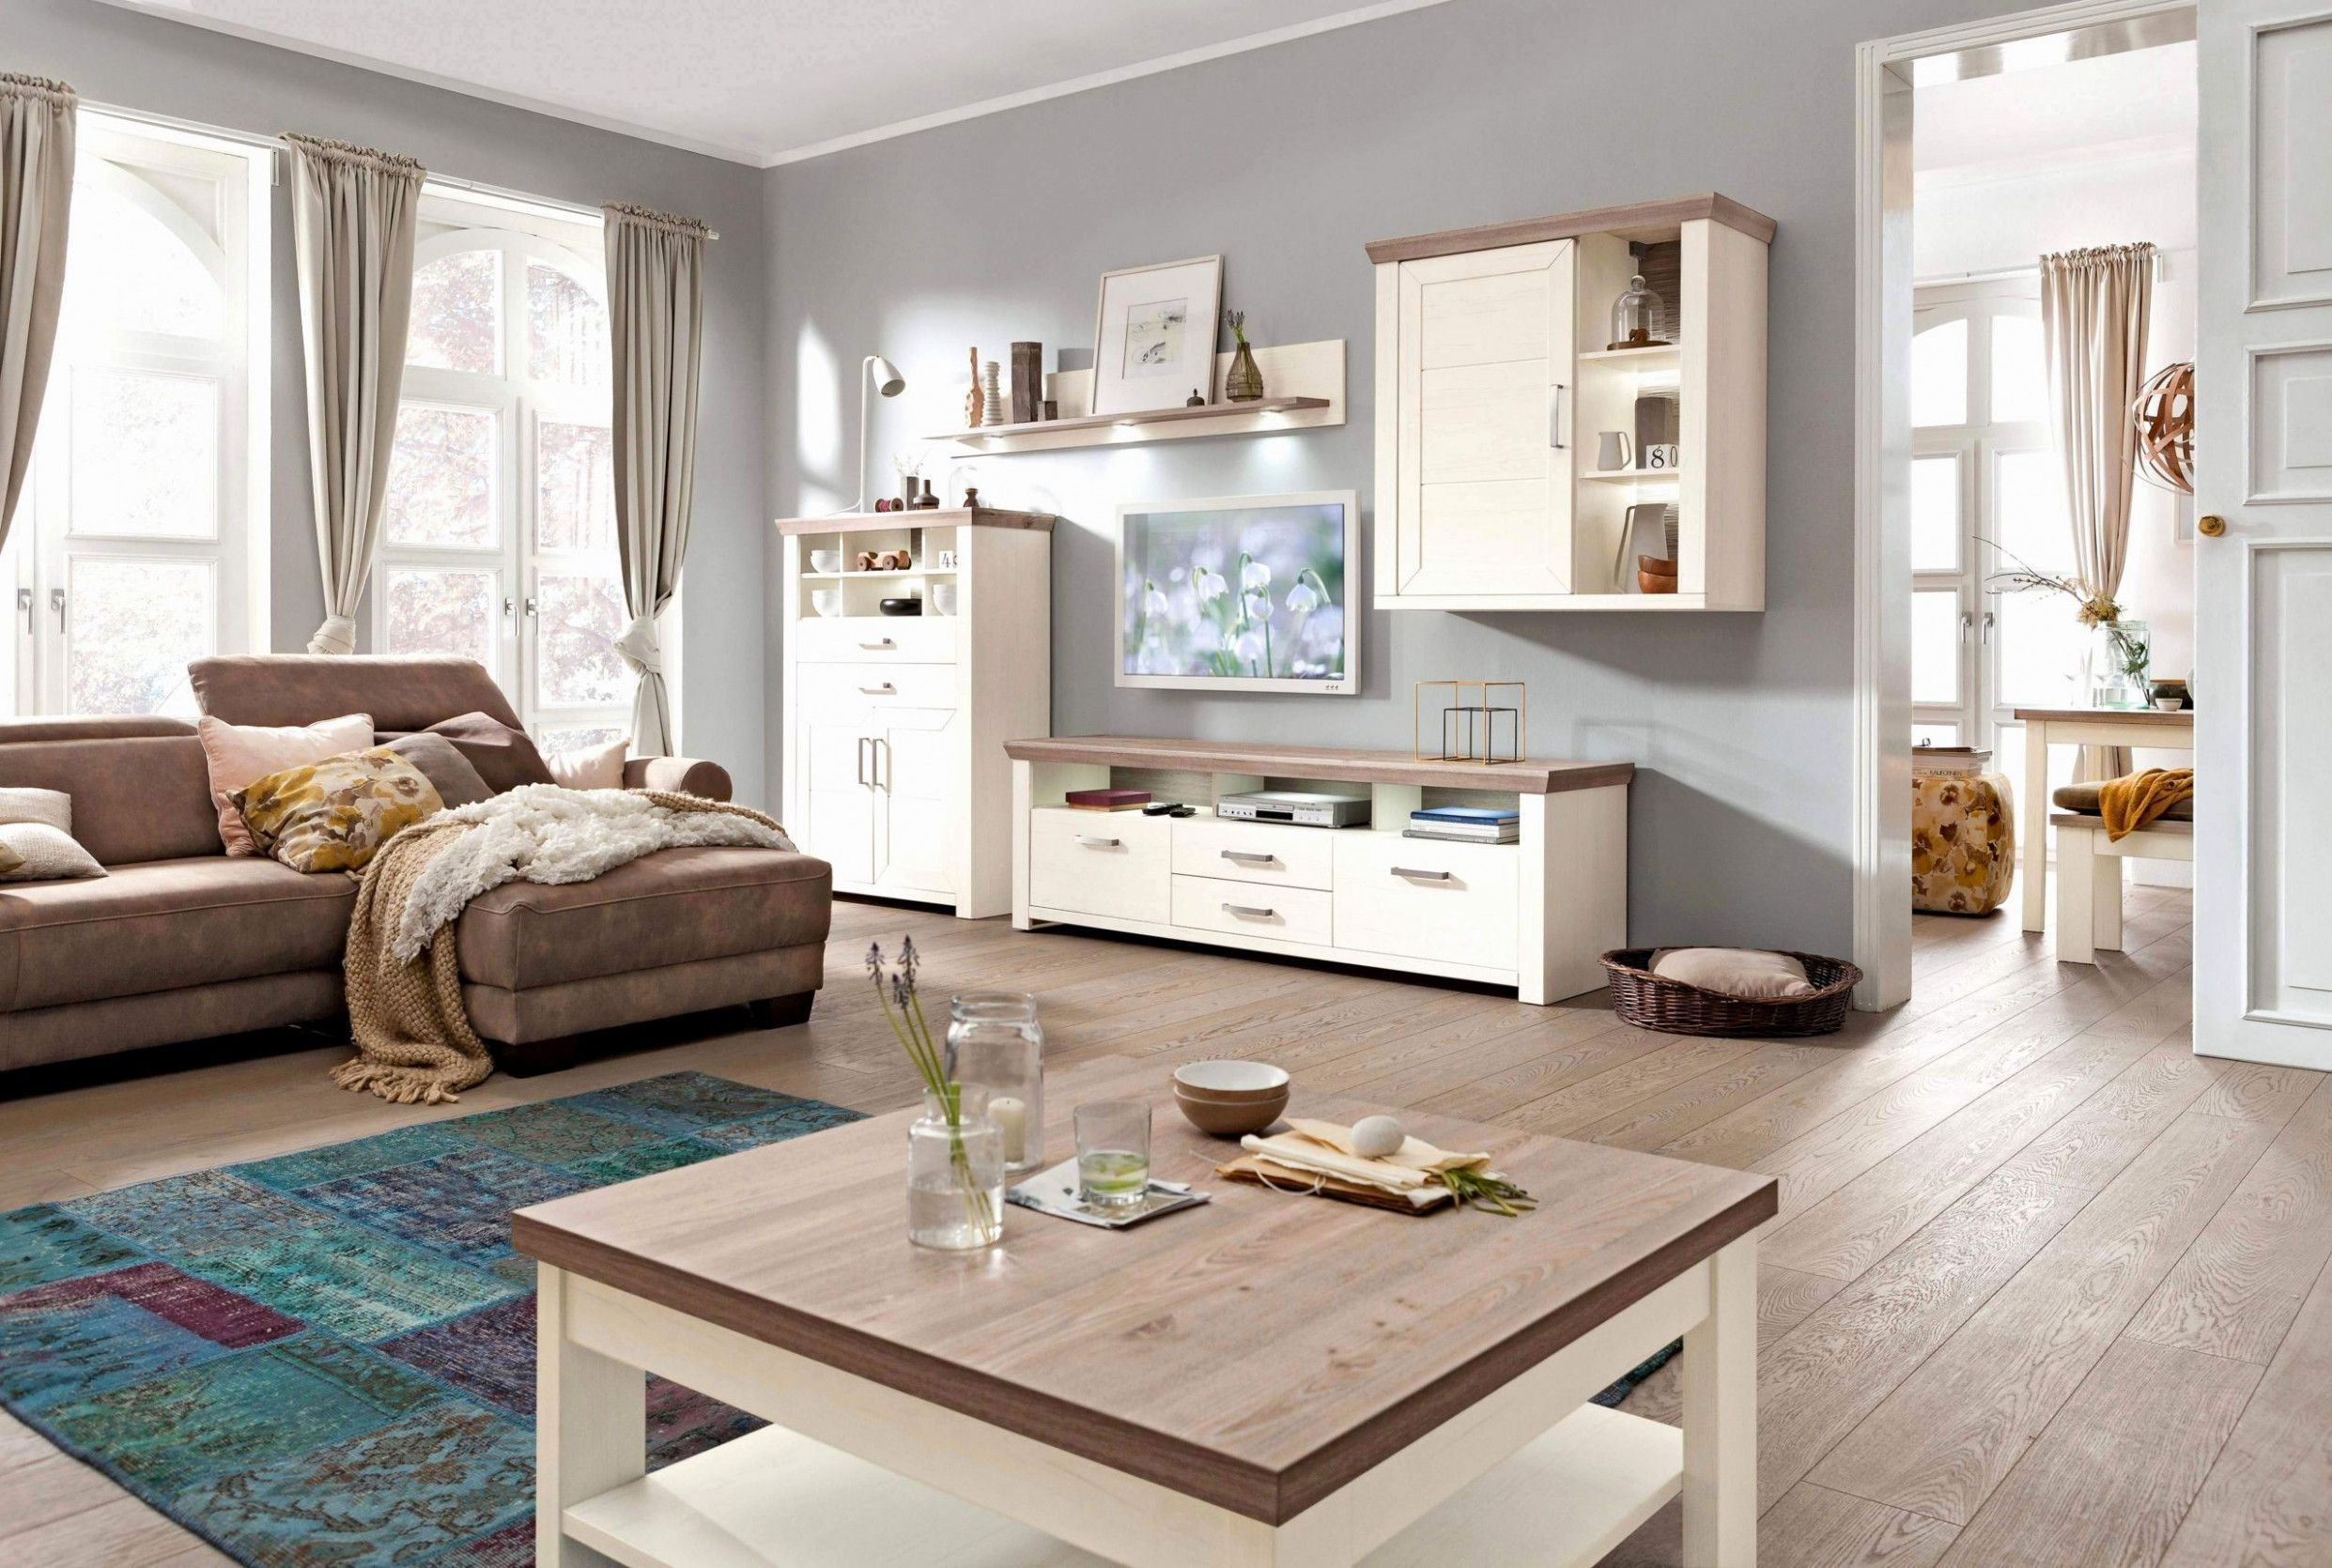 8 Wohnzimmer Moderner Landhausstil in 8  Home design living